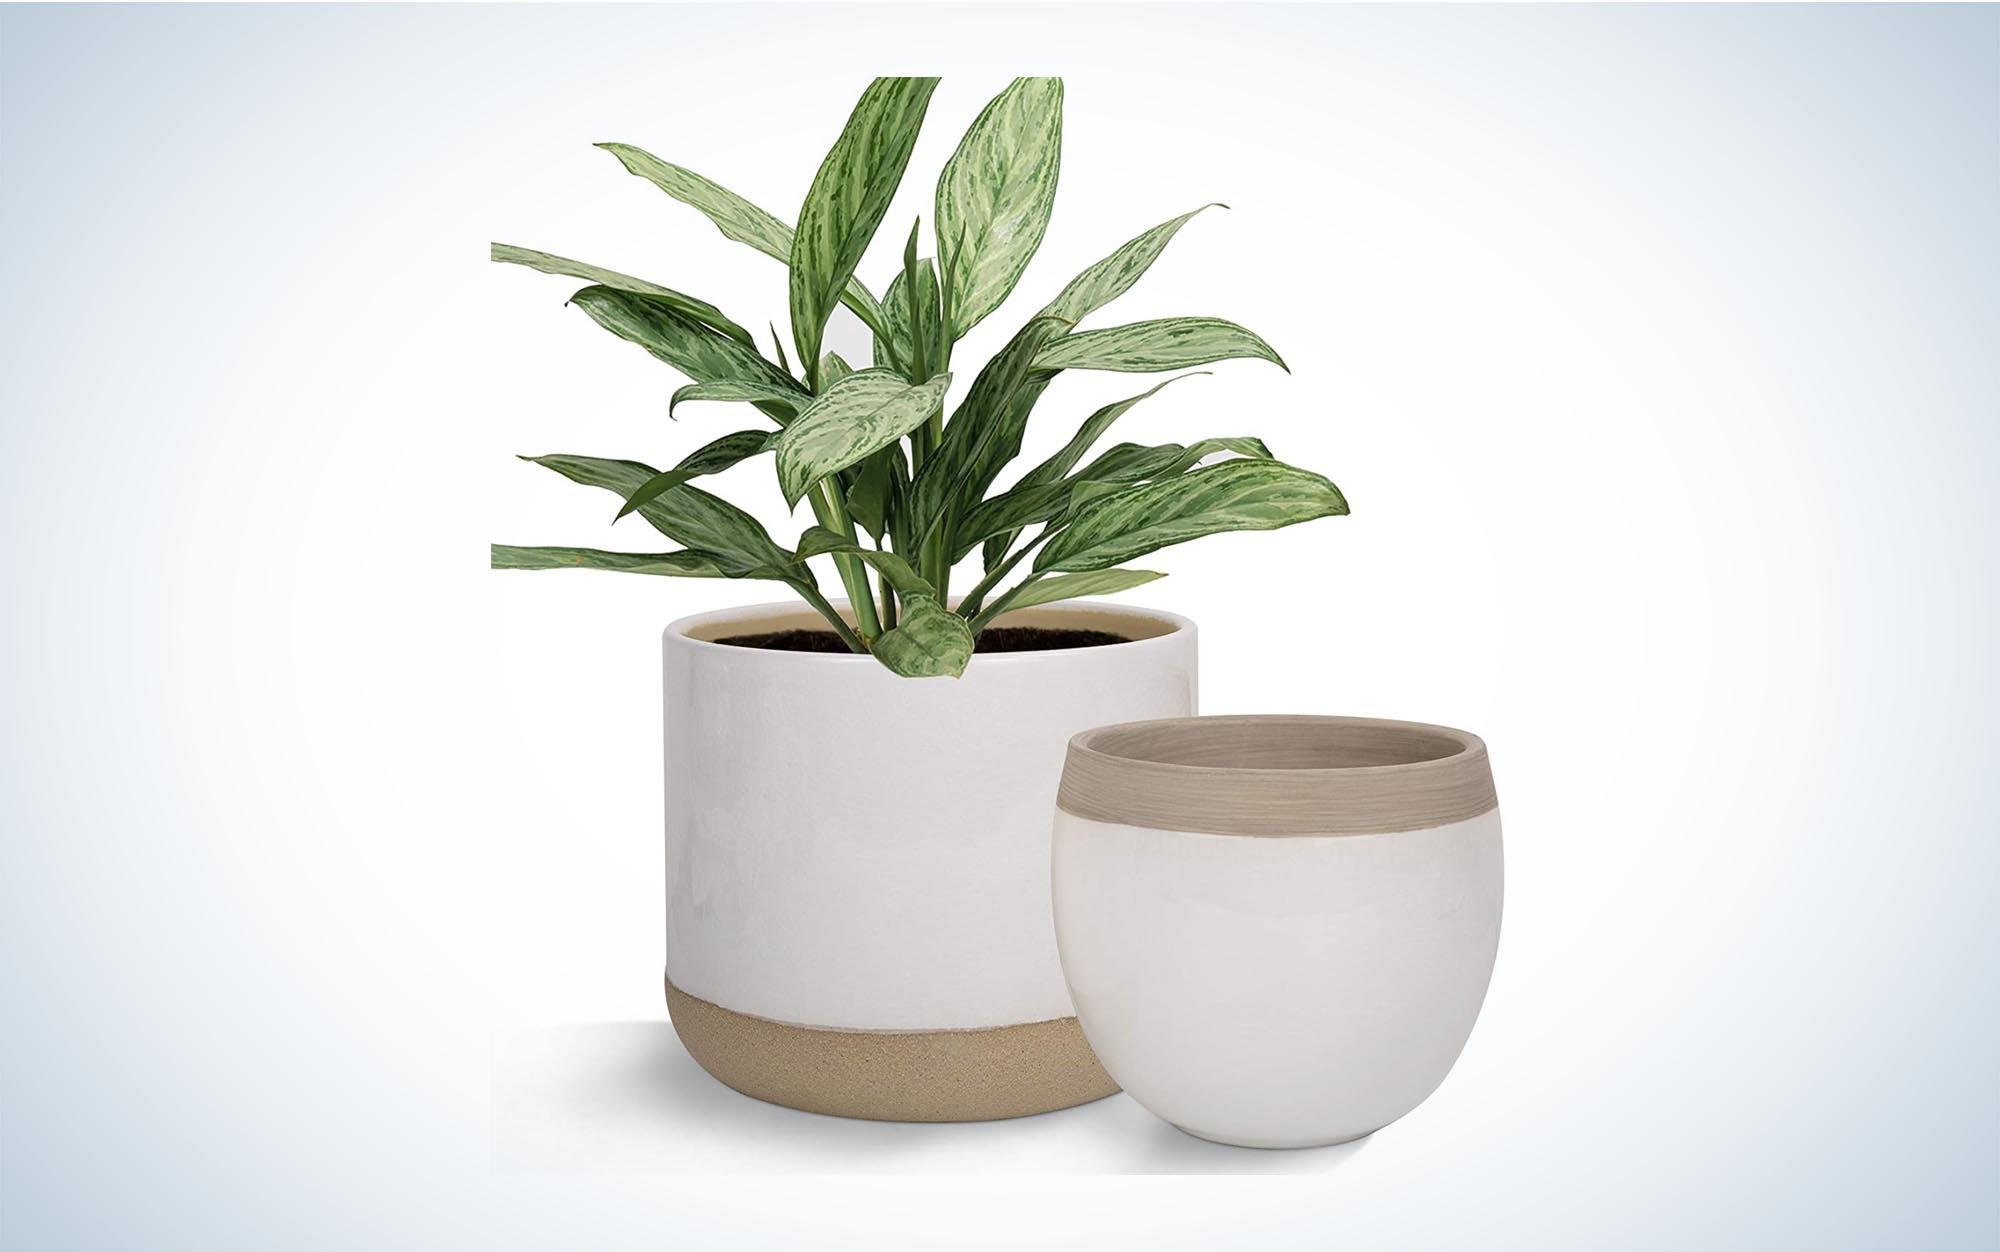 White Ceramic Flower Plant Pots